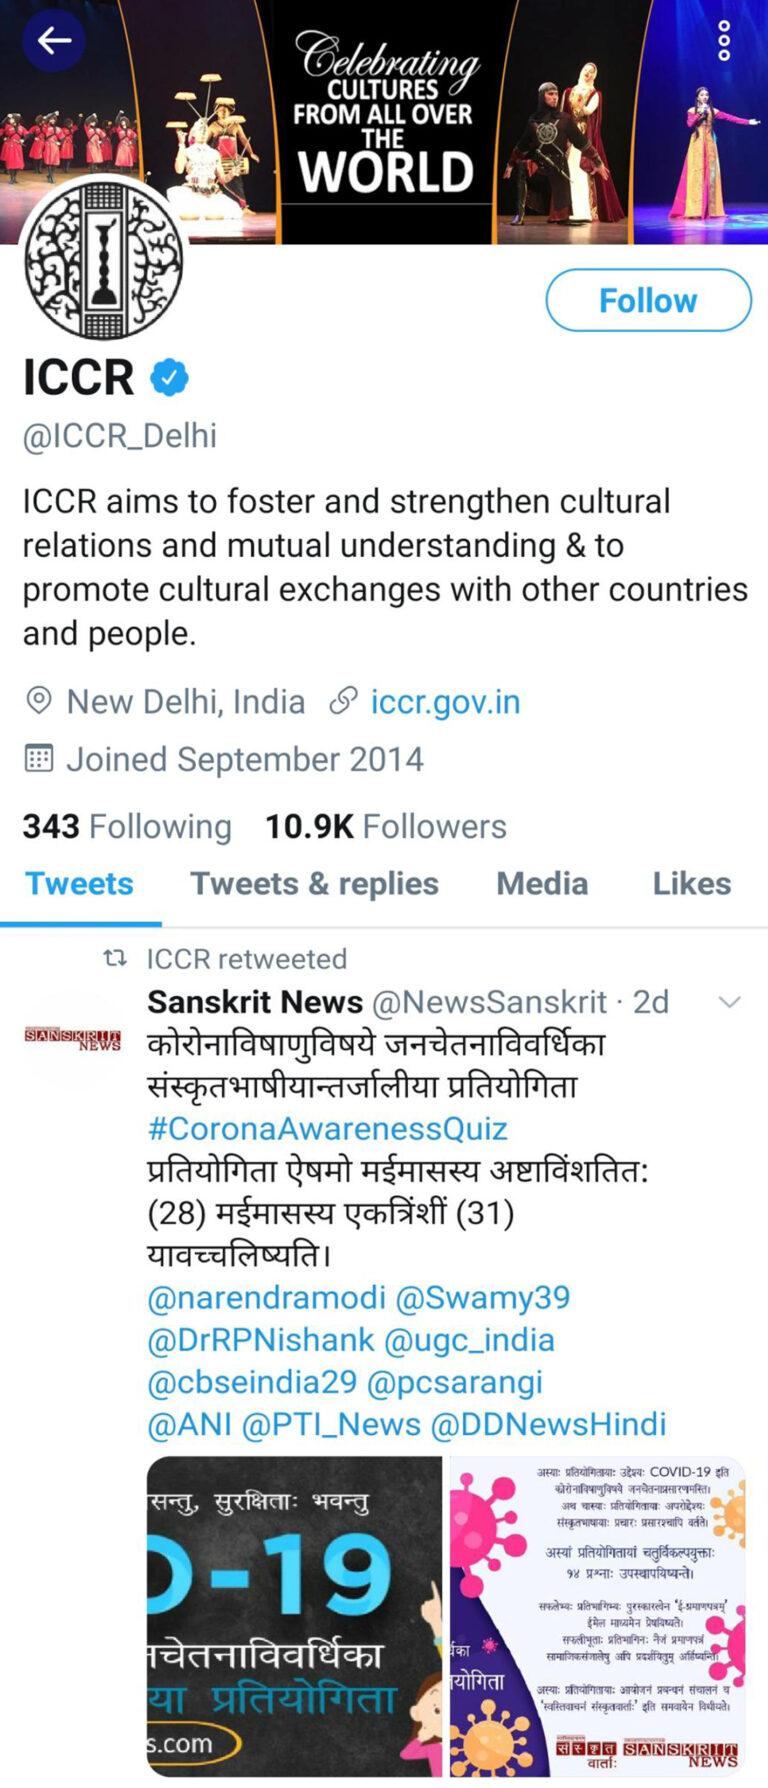 ICCR Tweet